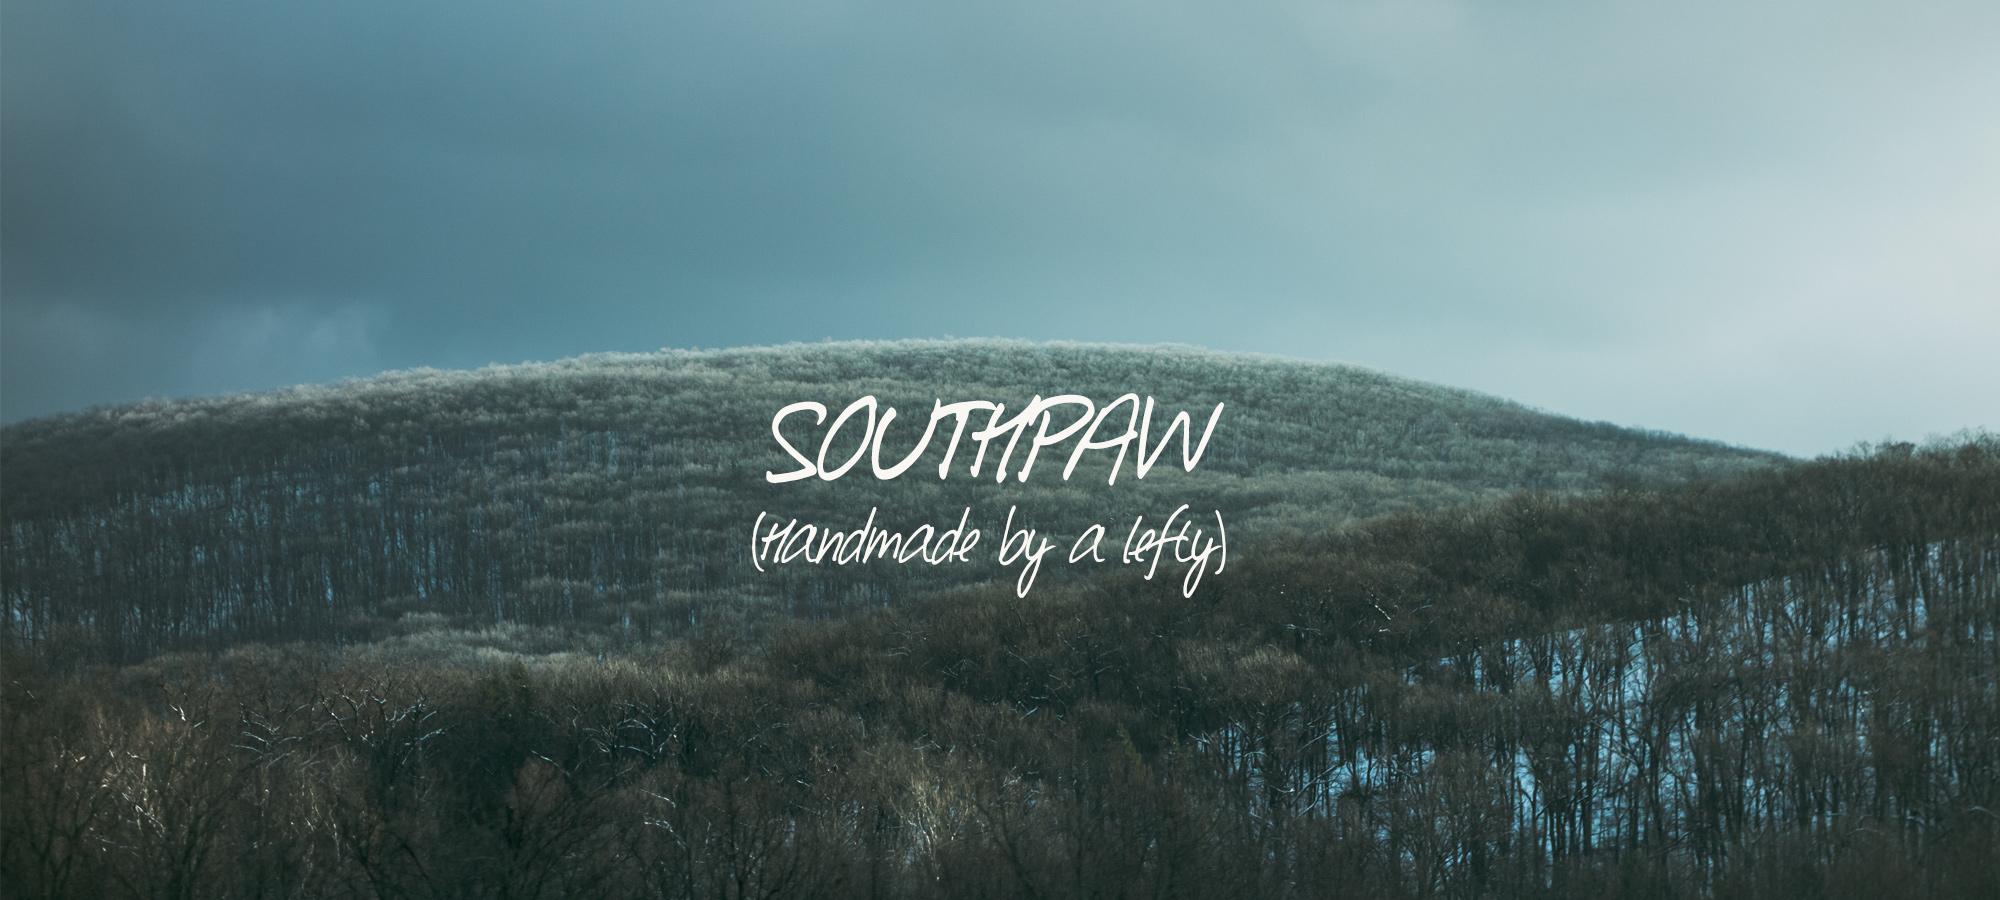 southpaw-title